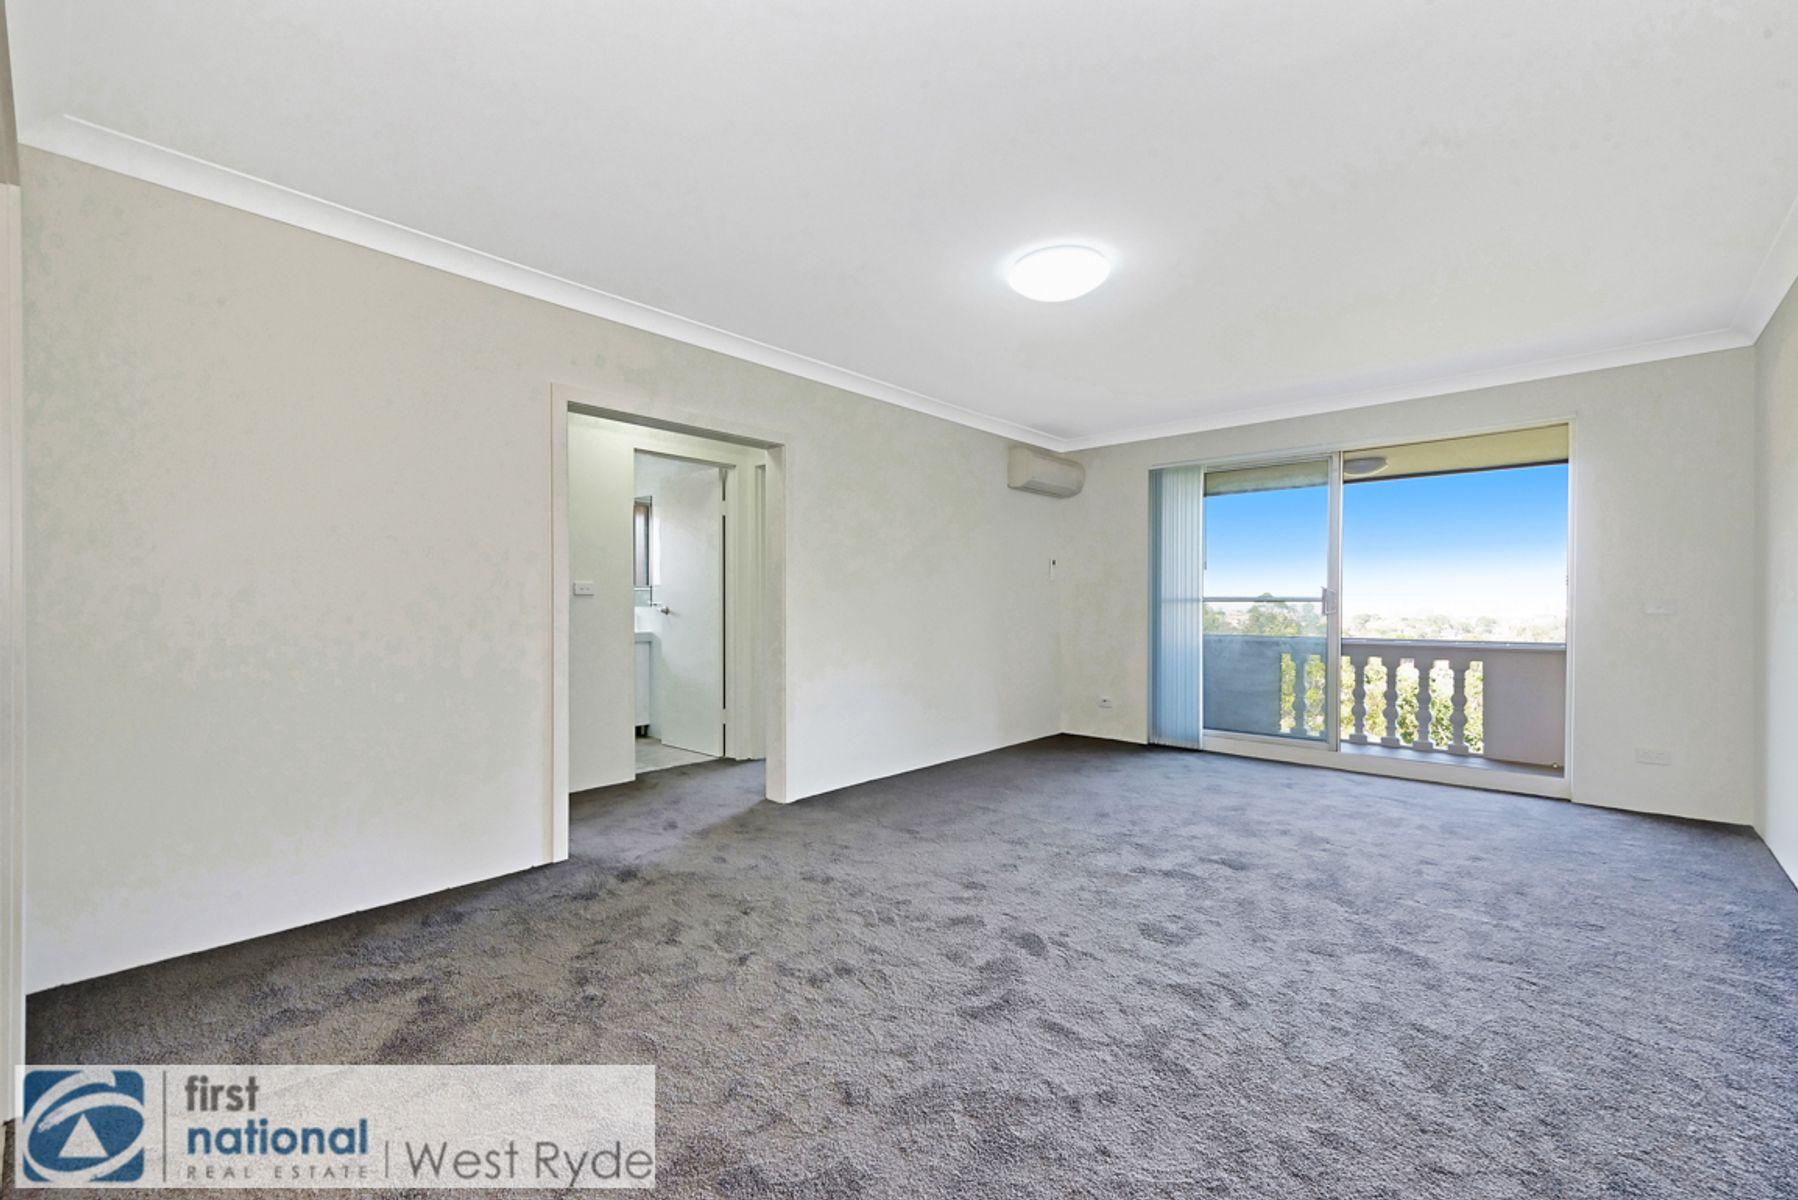 14/226 Blaxland Road, Ryde, NSW 2112